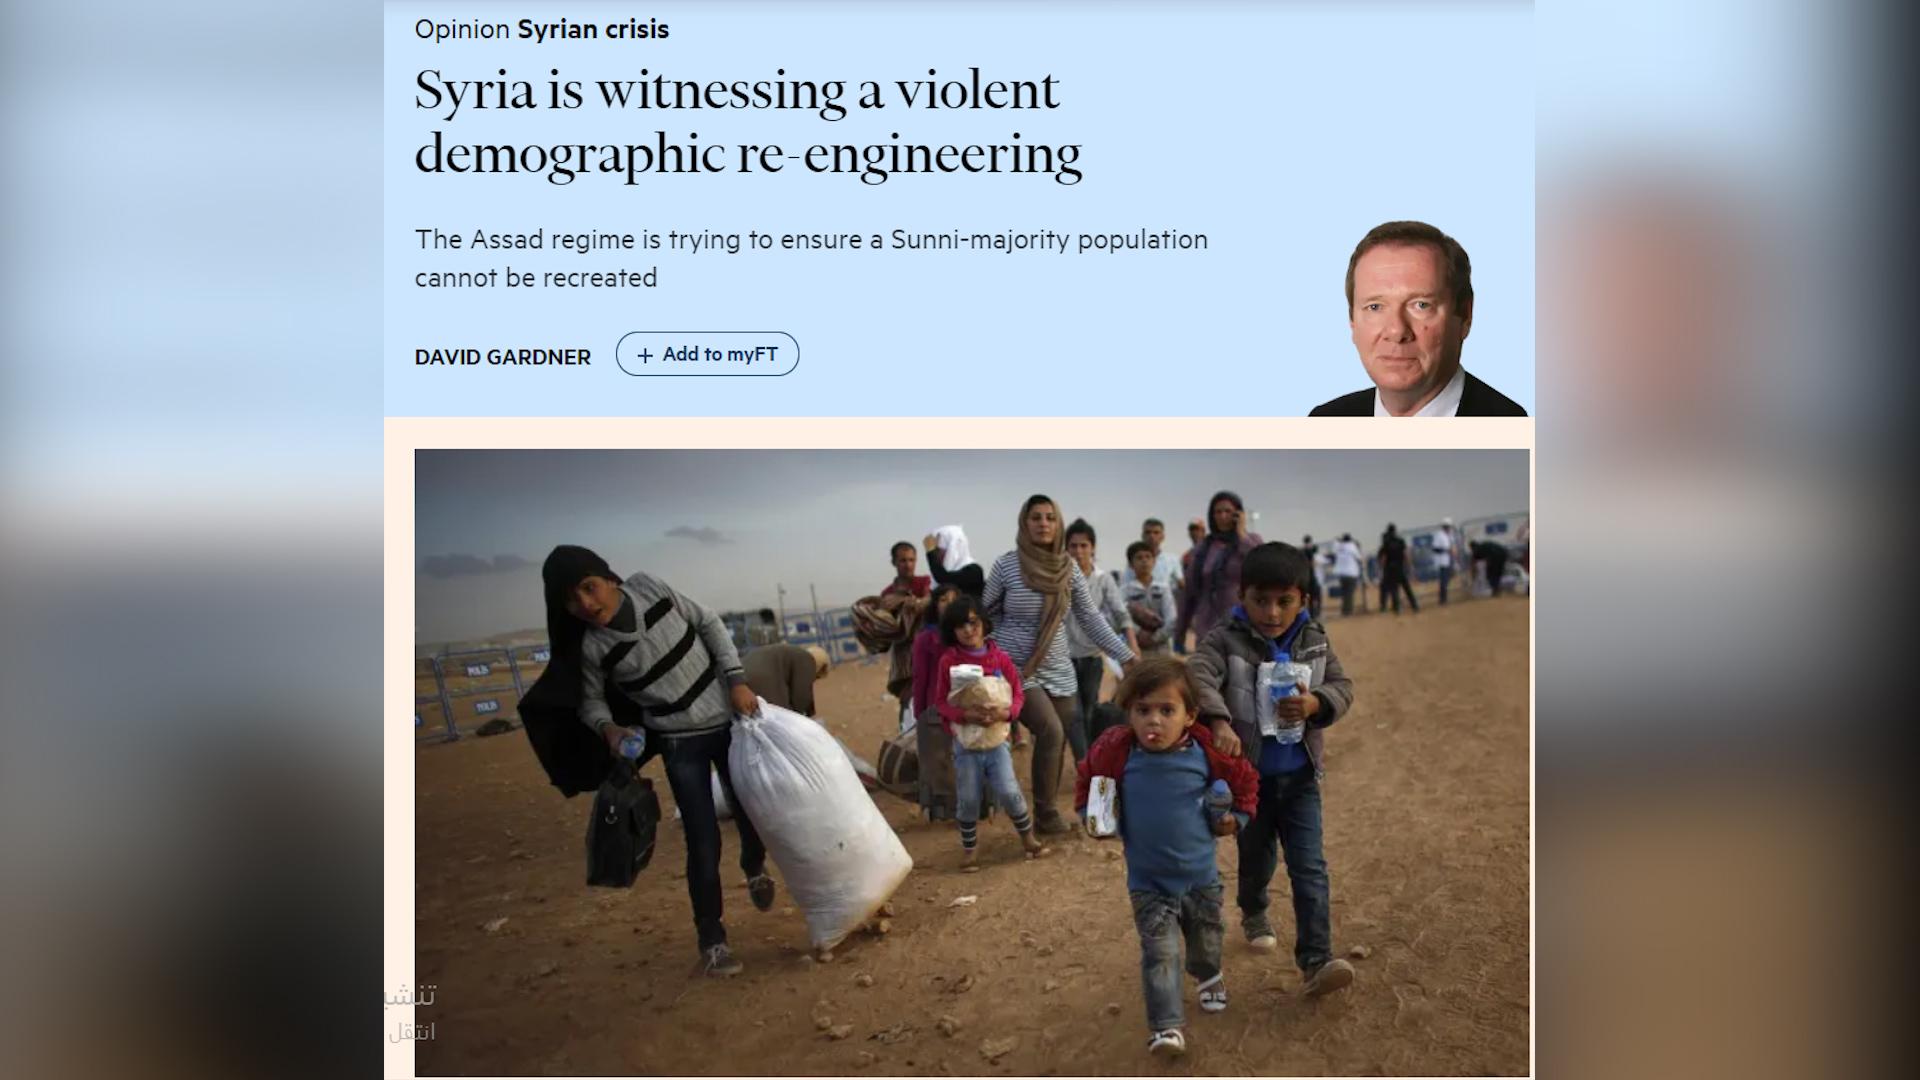 Photo of صحيفة بريطانية: التدخل التركي في سوريا بحجة محاربة الإرهاب كانت خطة لسيطرتها على الأراضي السورية